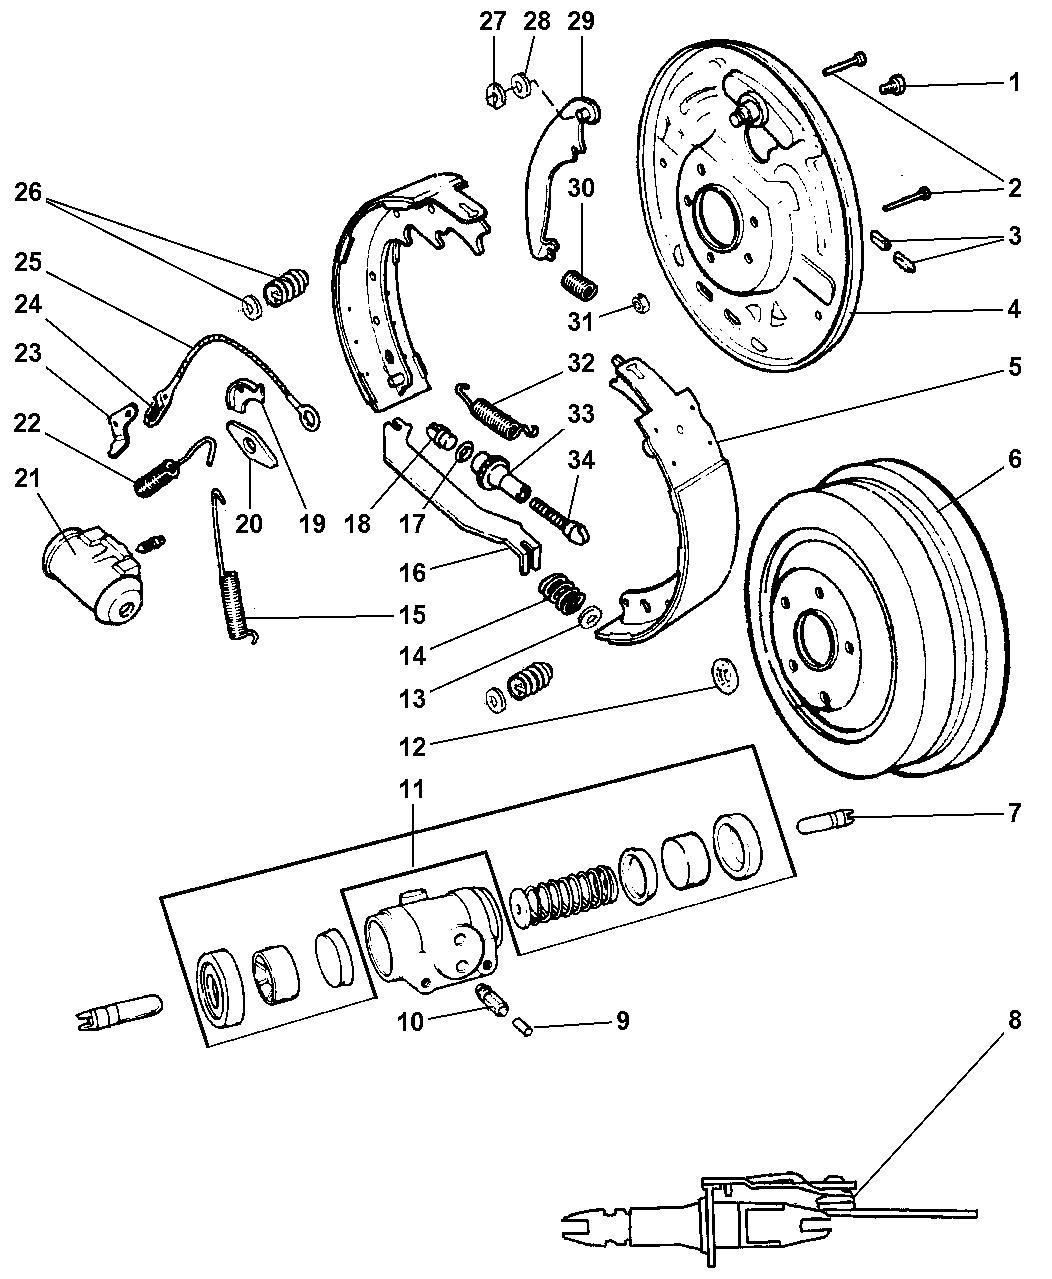 Bhkh7296